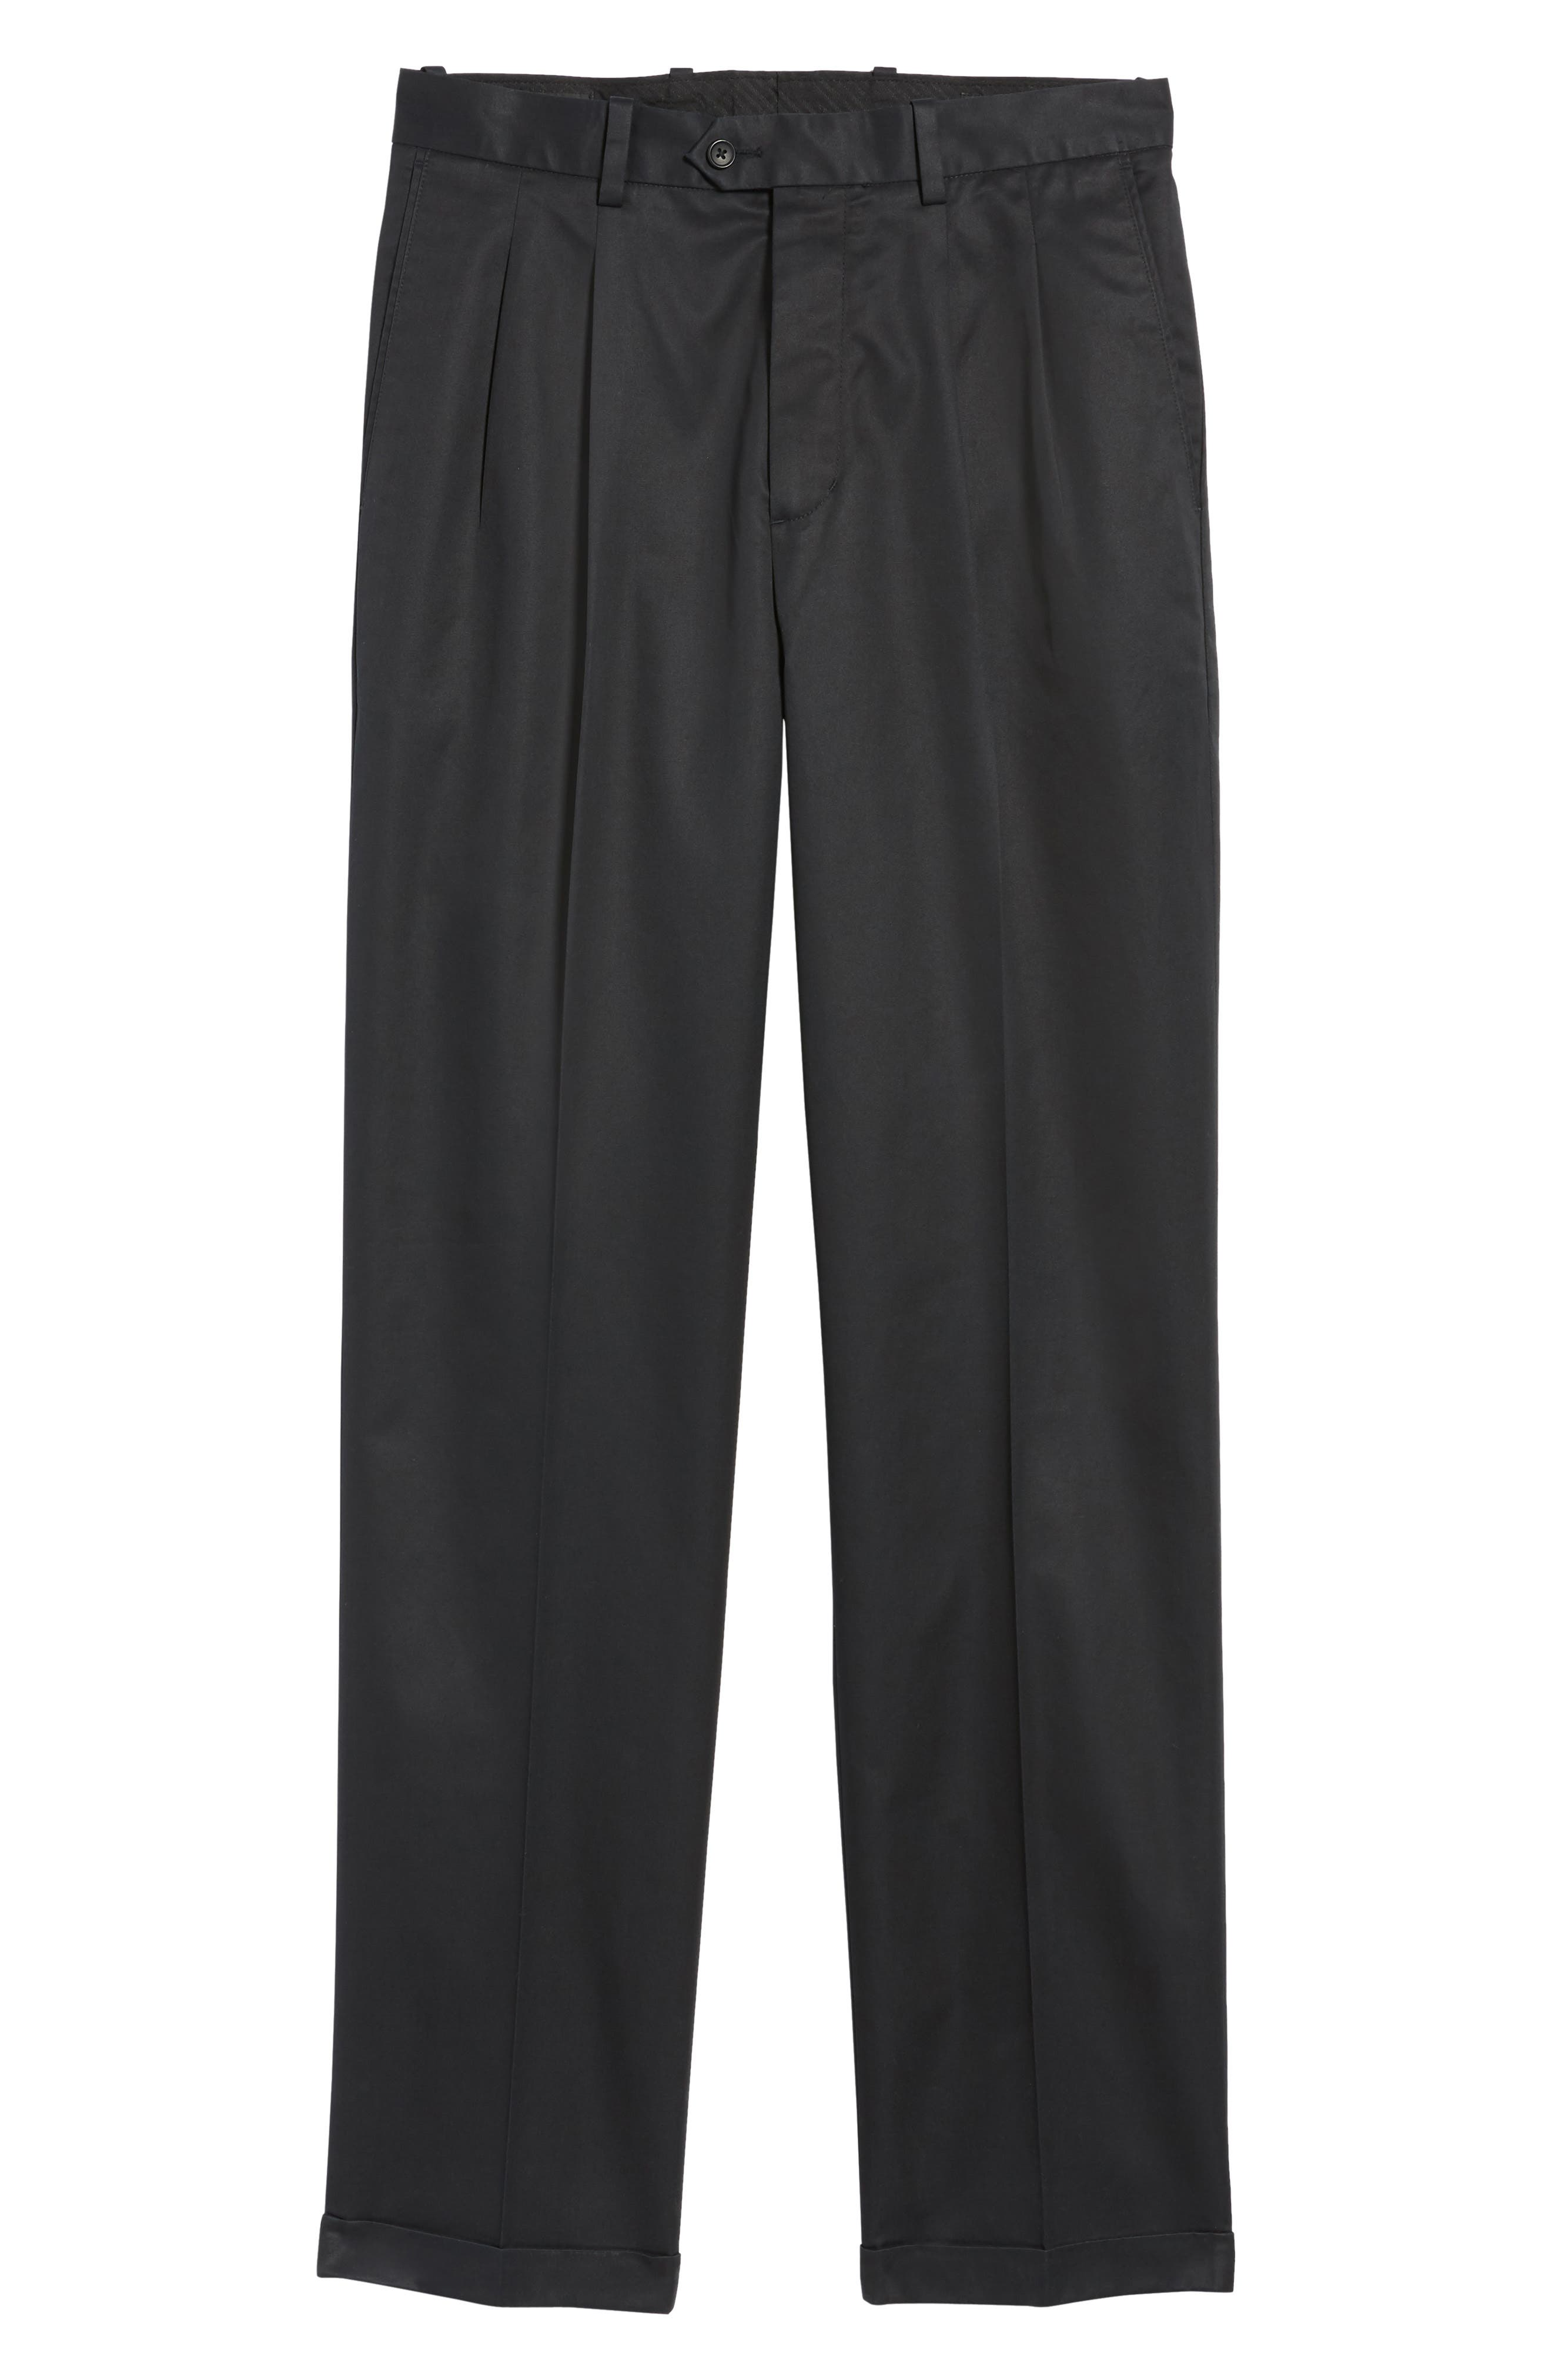 NORDSTROM MEN'S SHOP, Classic Smartcare<sup>™</sup> Supima<sup>®</sup> Cotton Pleated Trousers, Main thumbnail 1, color, BLACK CAVIAR